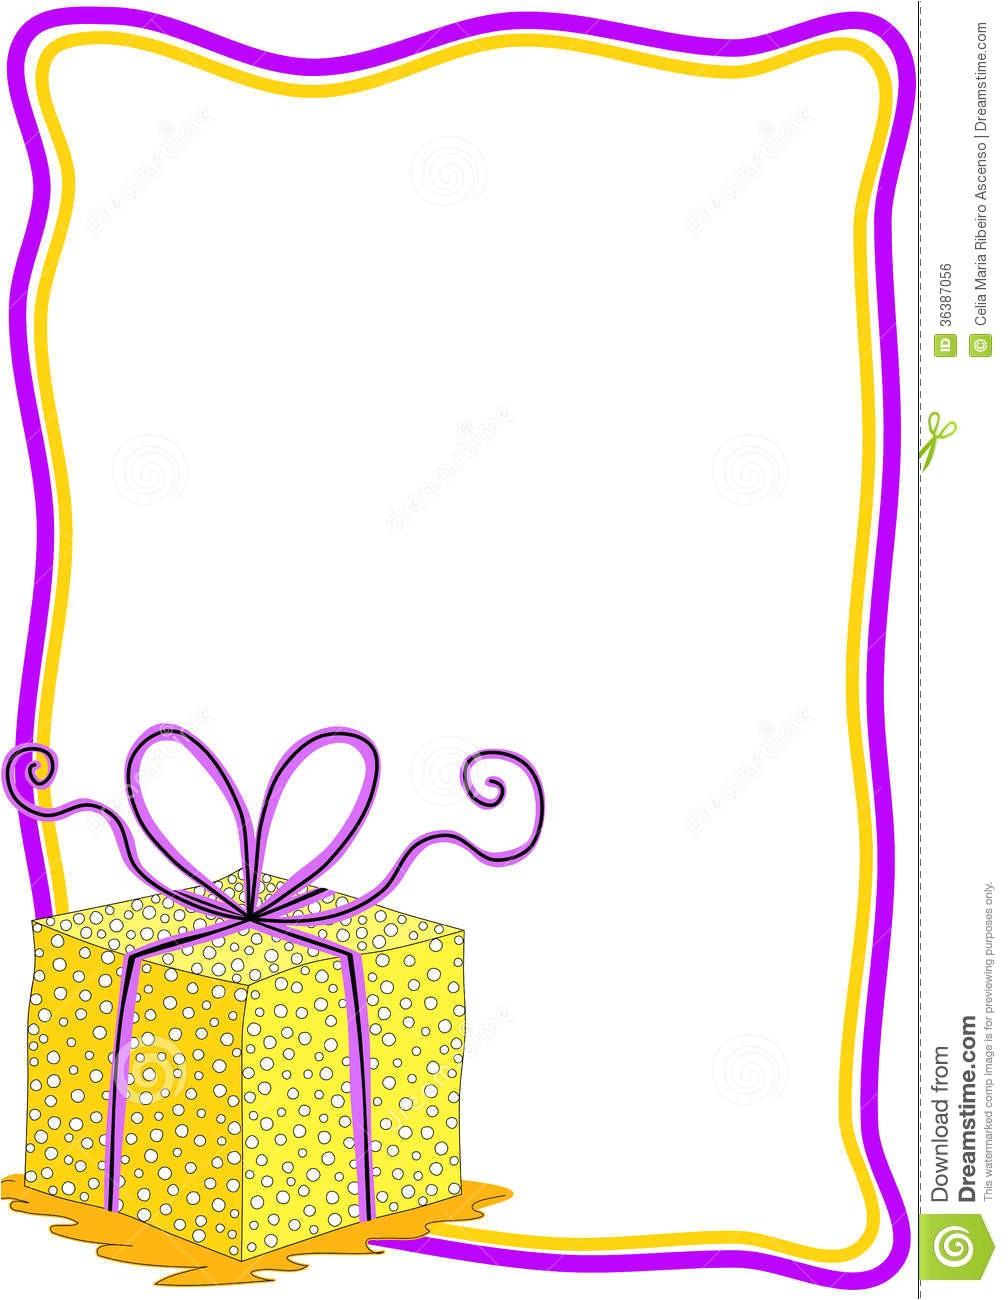 royalty free stock image t box invitation card frame birthday tag border polka dot image